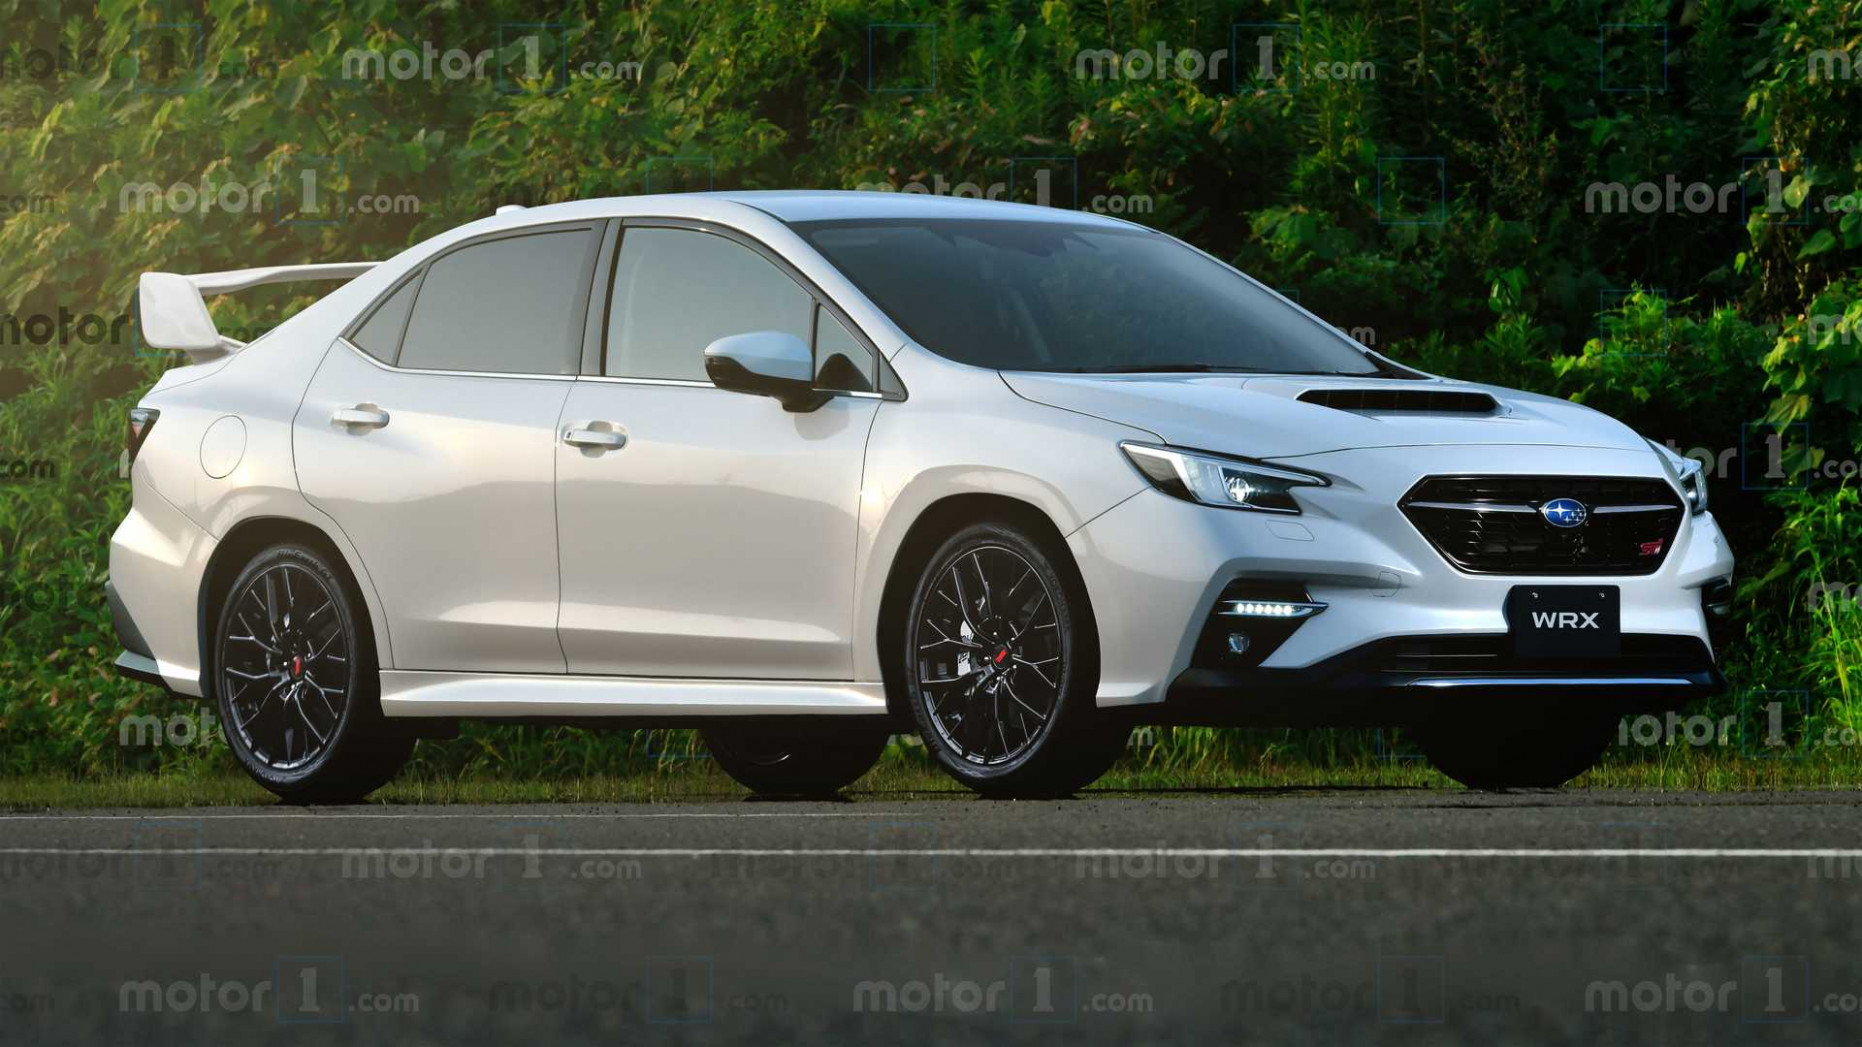 Picture Subaru Wrx Hatchback 2022